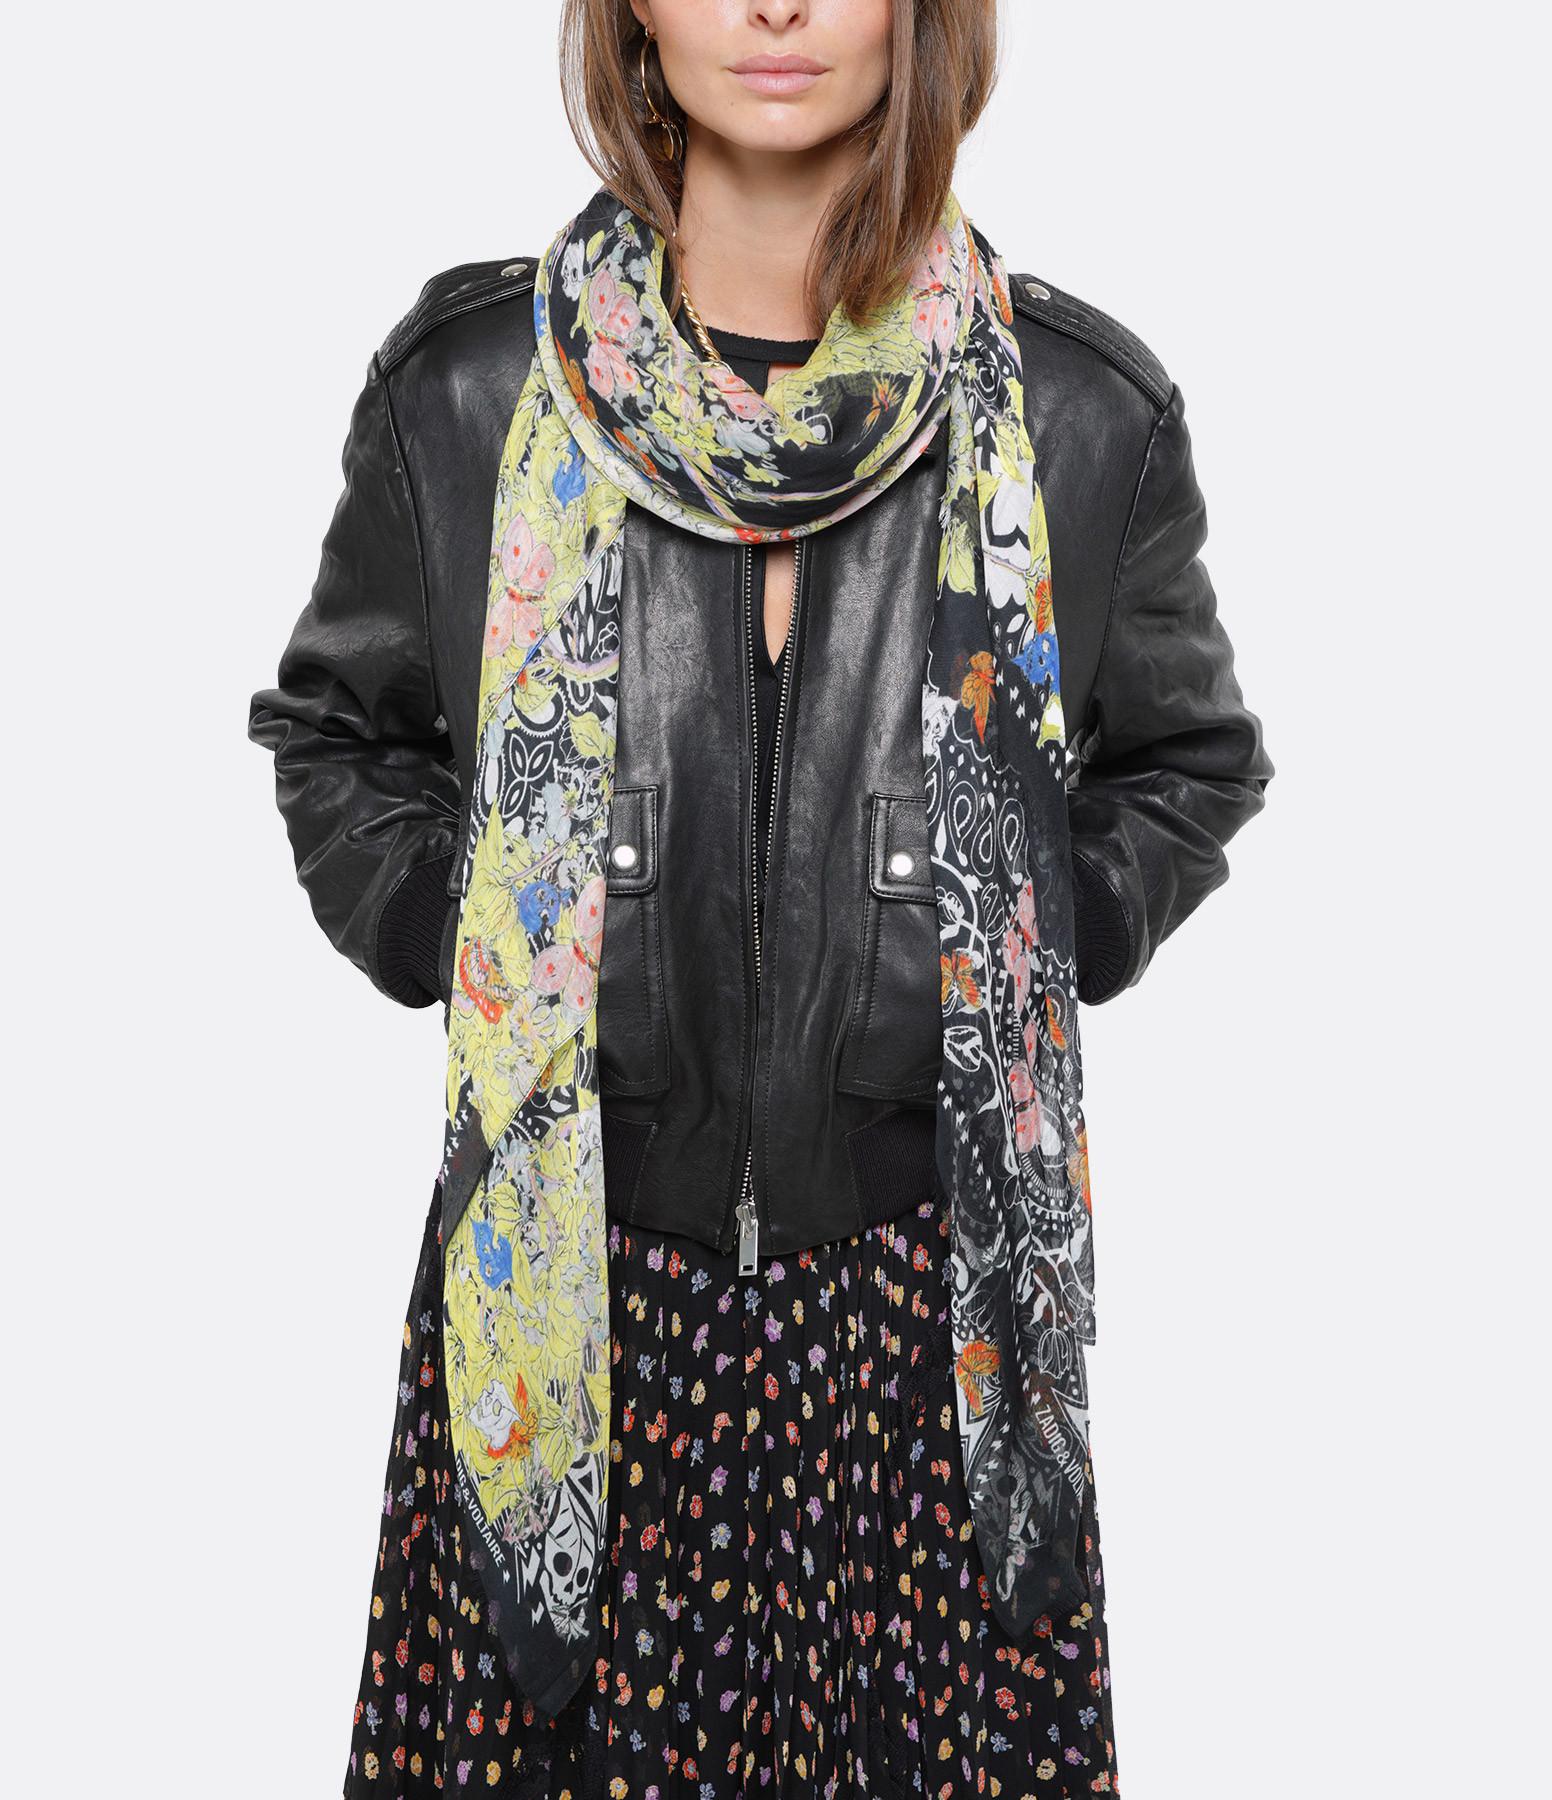 ZADIG & VOLTAIRE - Foulard Fray Blossom Noir